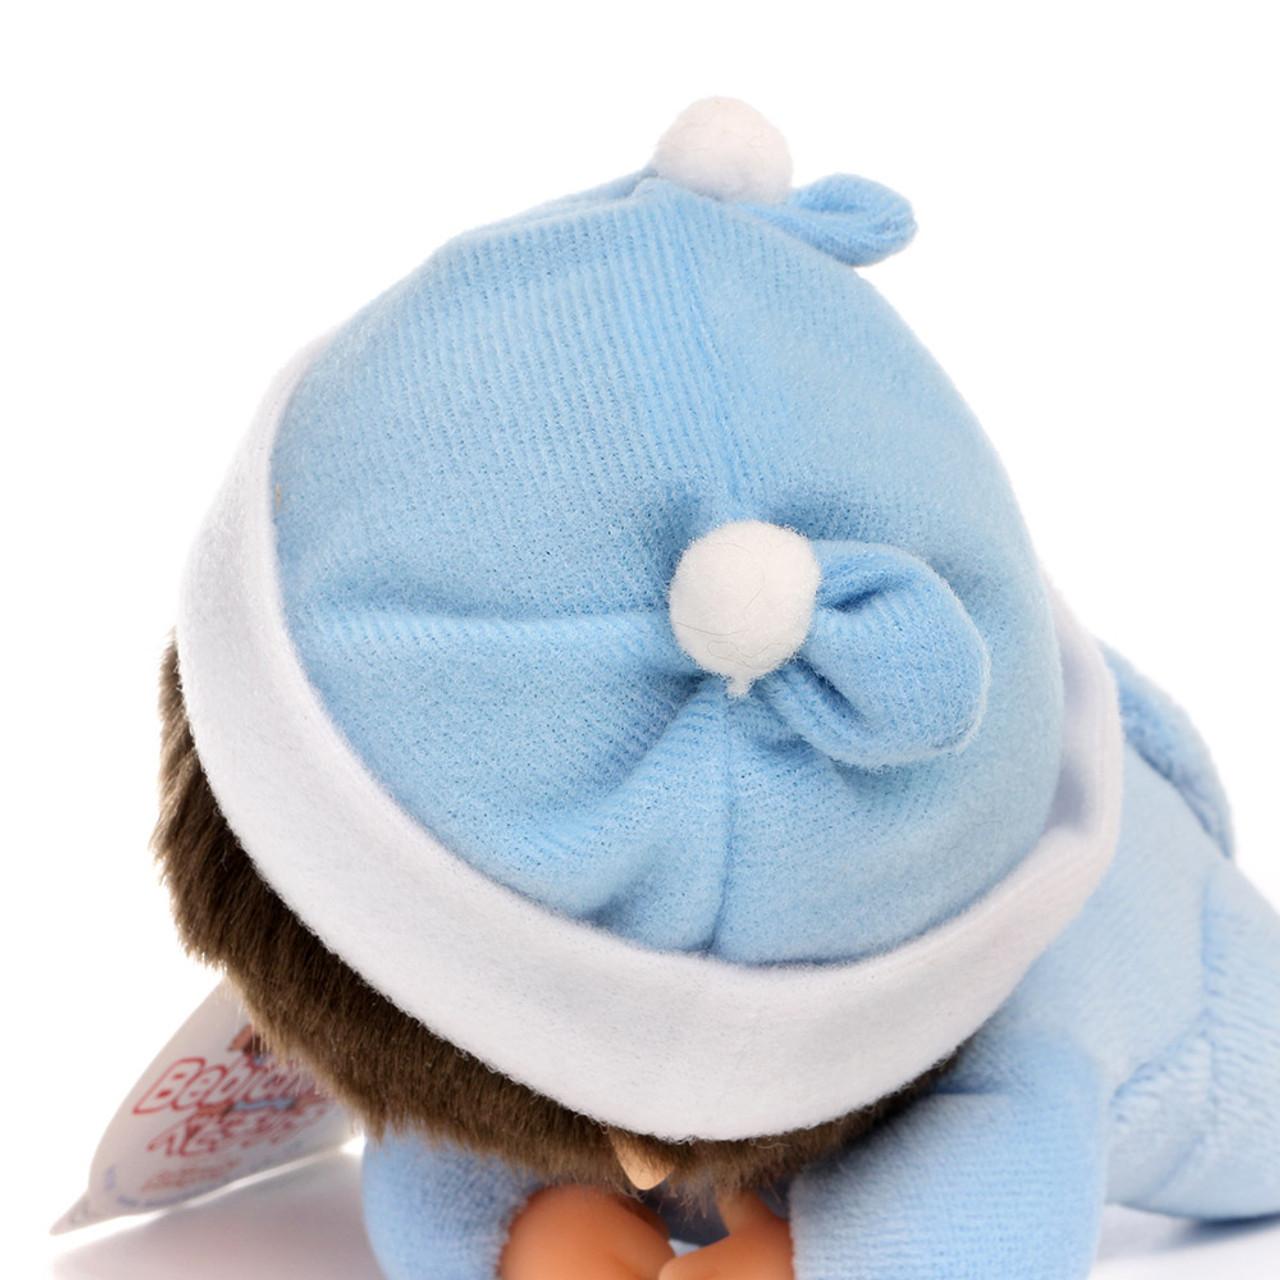 Sekiguchi Bebichhichi Monkey Boy Baby Shirt Crawling Plush Doll - Small ( Feature 01 )